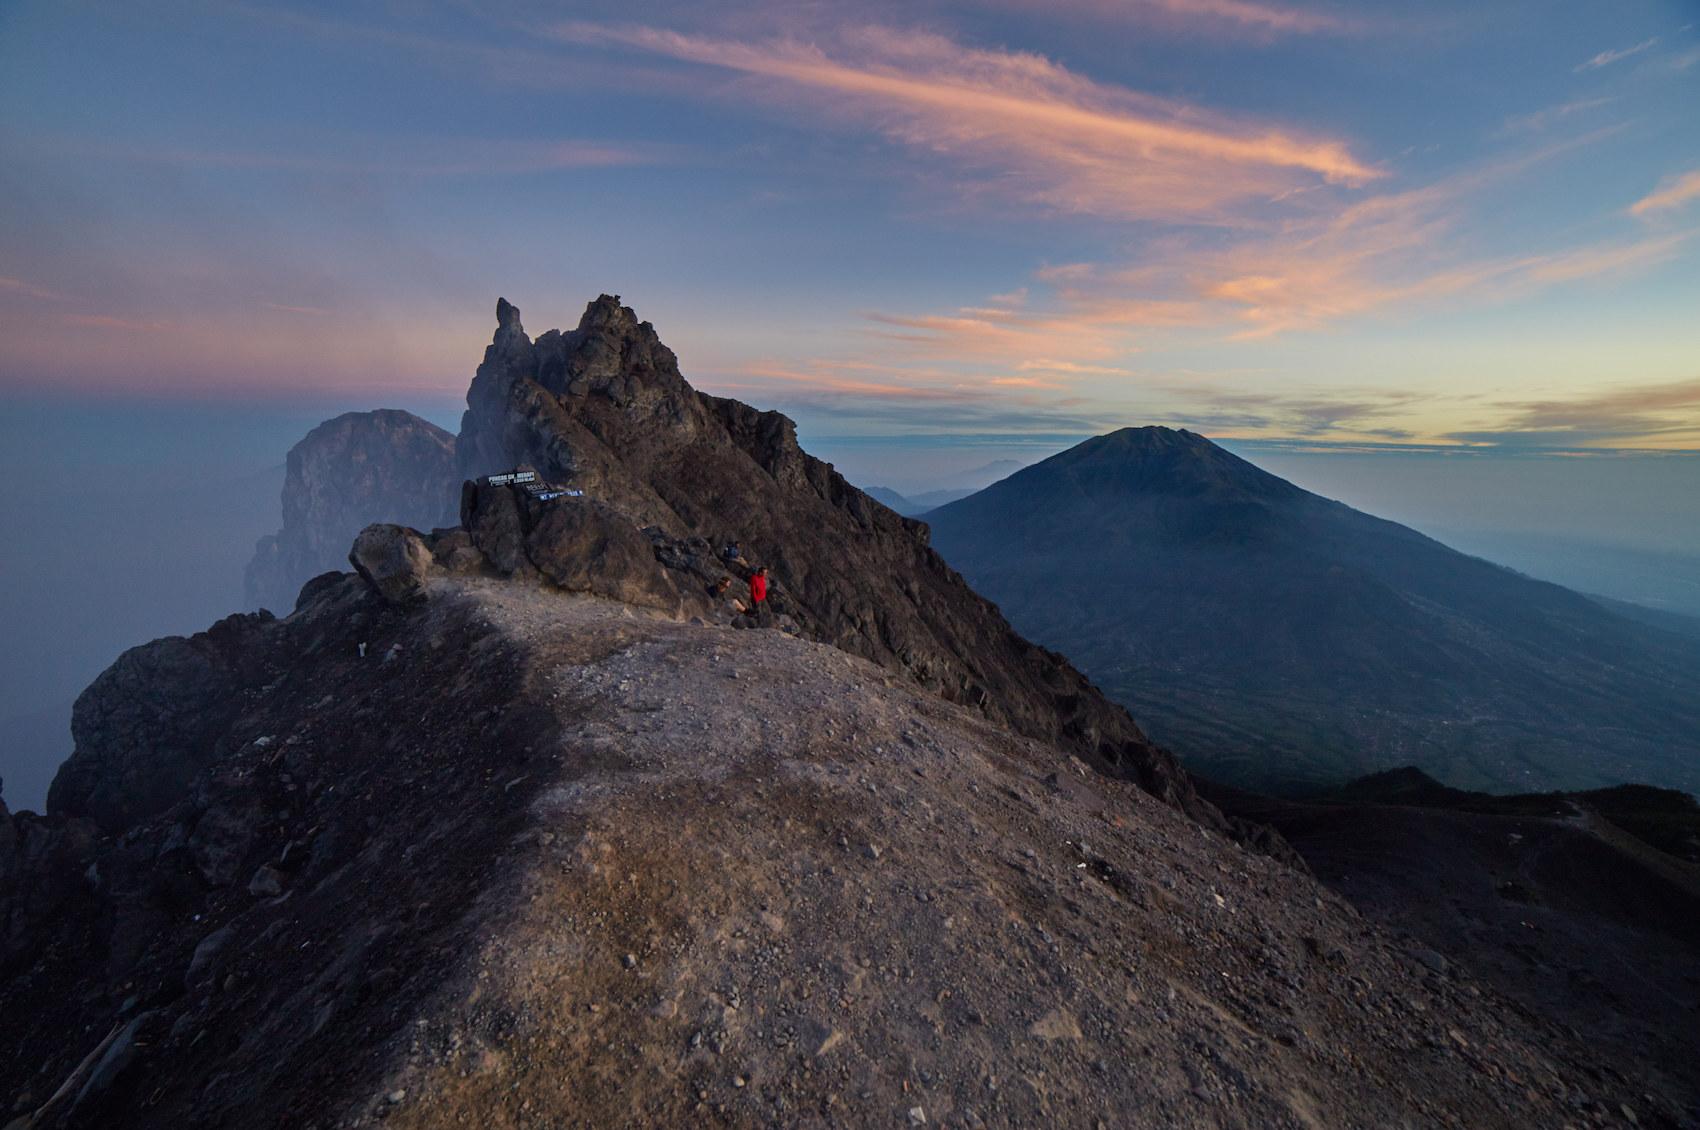 Peak of Mt. Merapi with Mt. Merbabu in Background